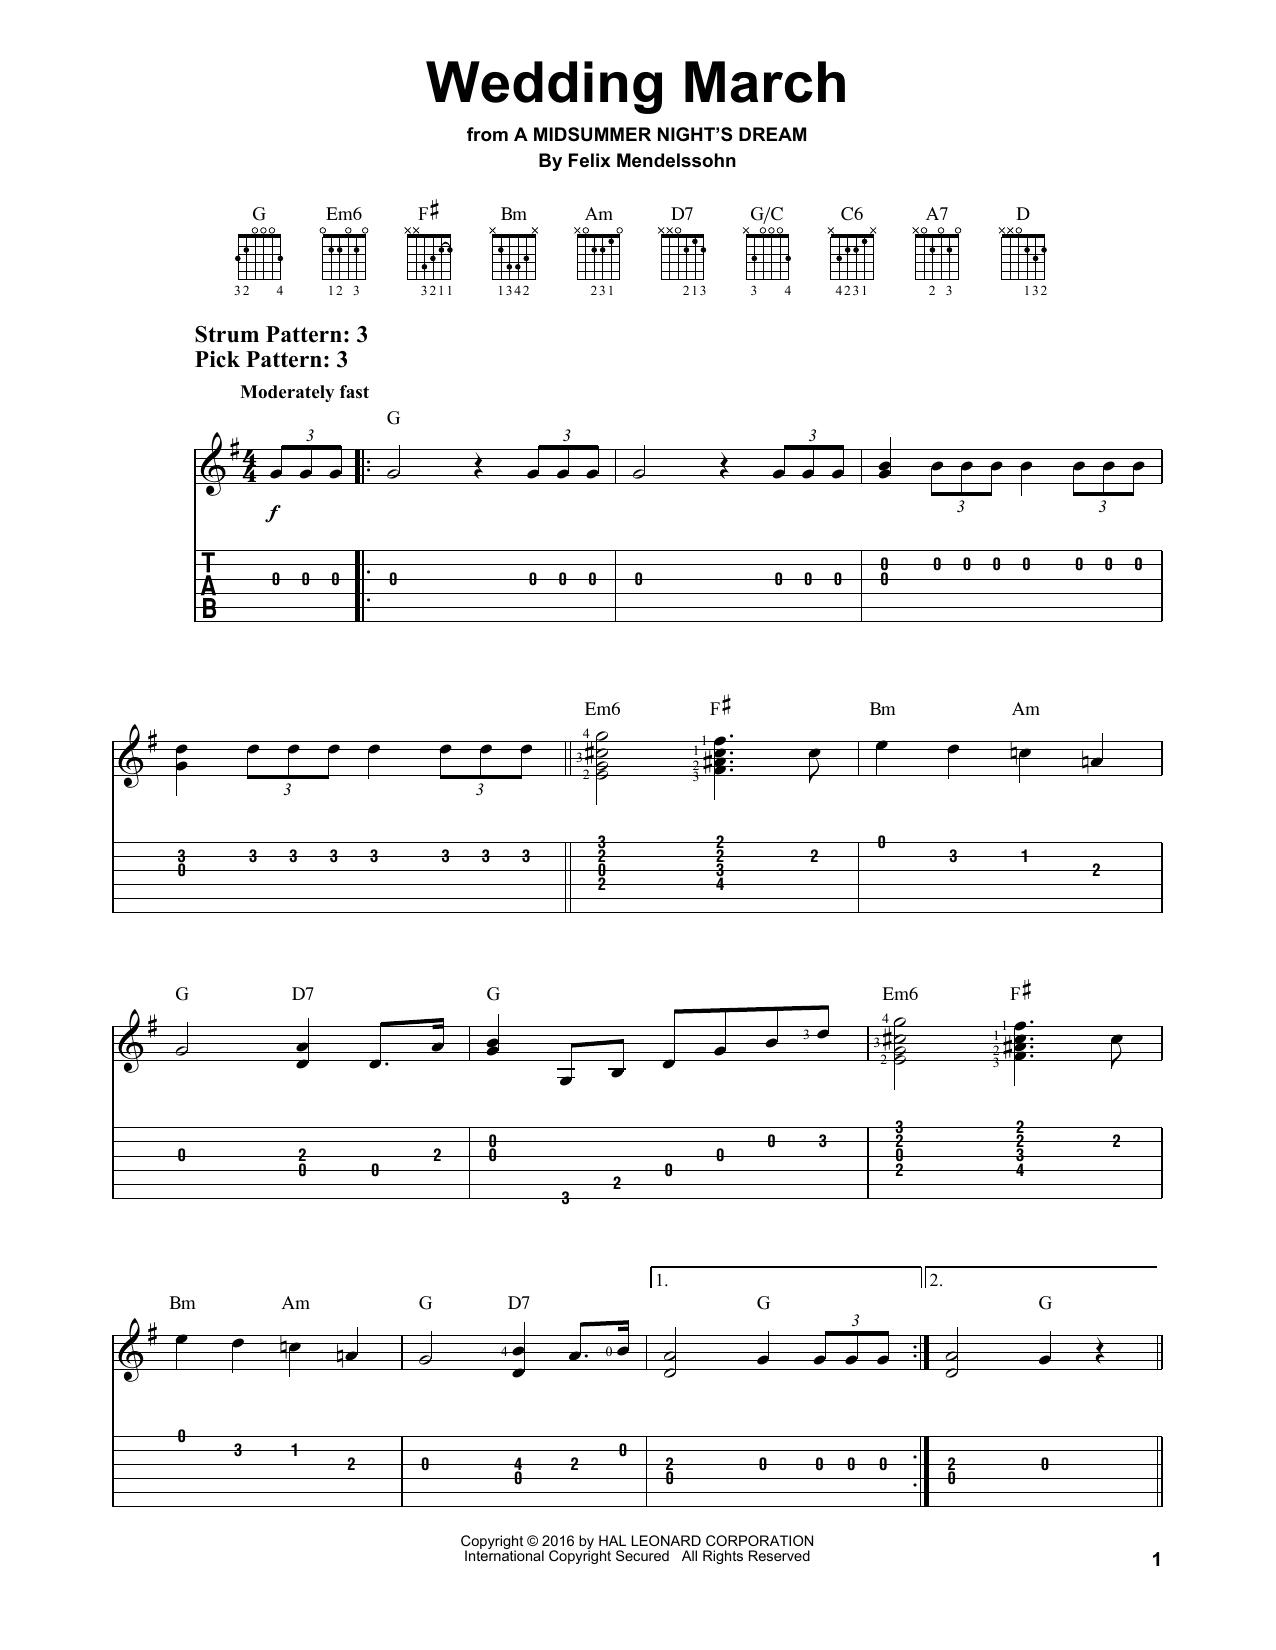 Wedding March Sheet Music Notes Felix Mendelssohn Chords Download